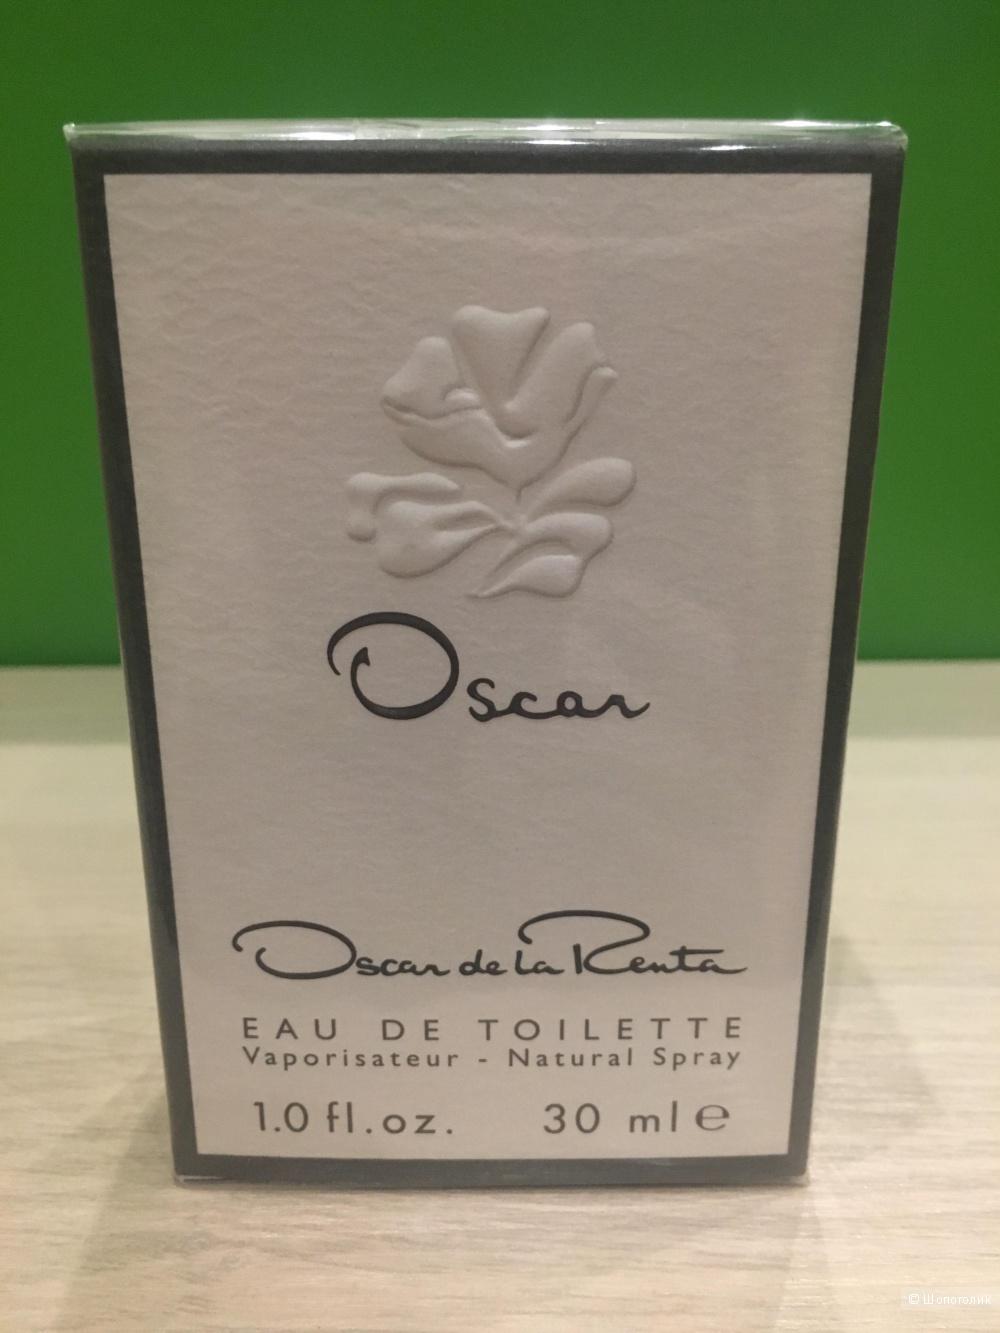 Oscar de la Renta Oscar 30мл.Eau de Toilette